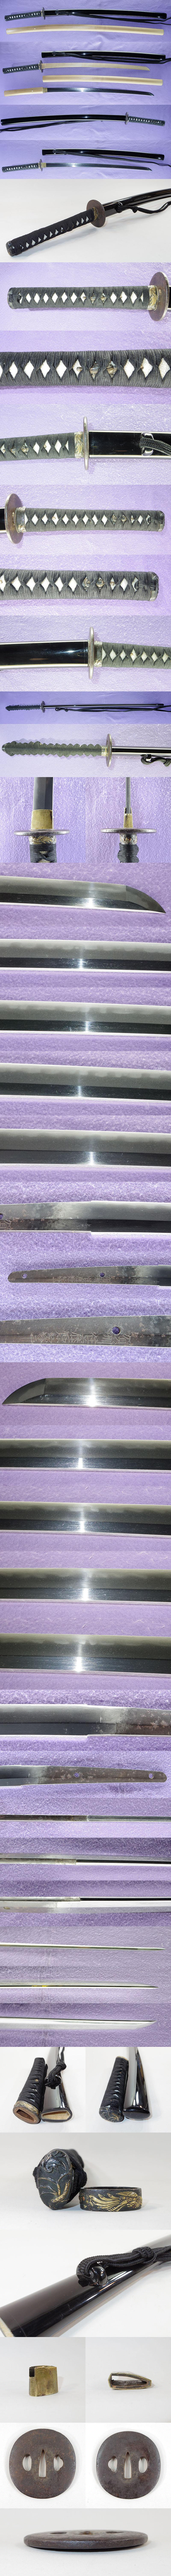 刀 賀州住藤原家平 Picture of parts